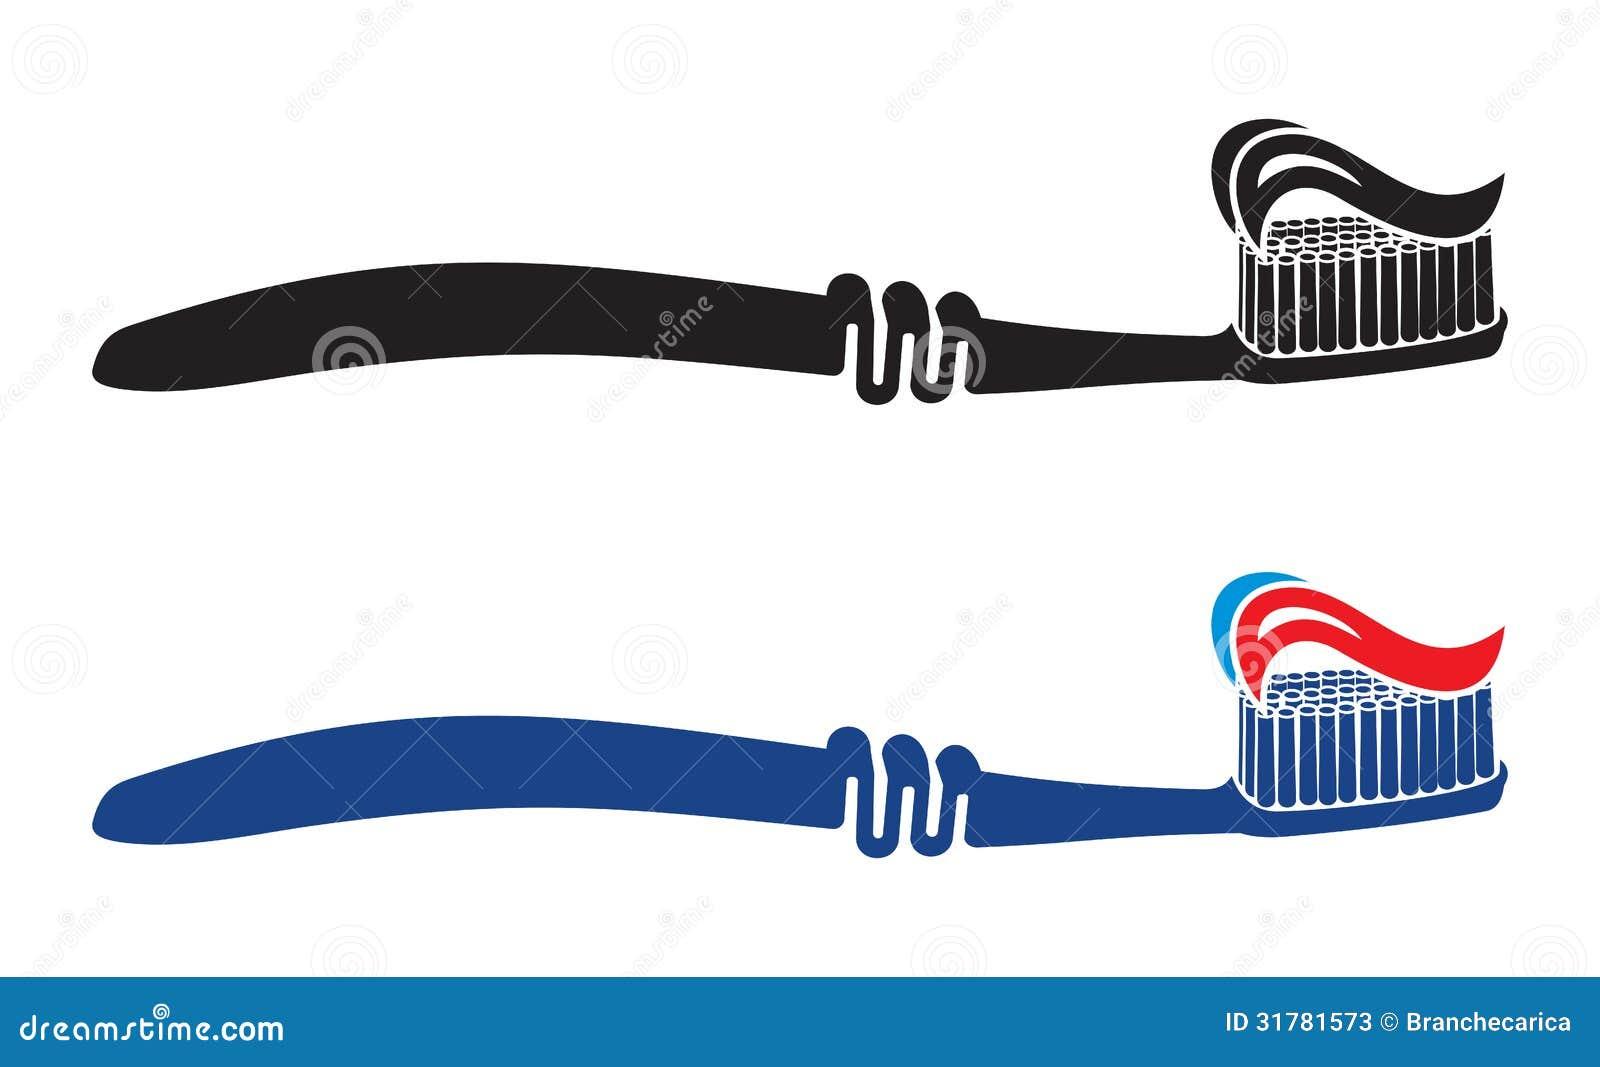 Toothbrush Set Illustration Stock Photos - Image: 31781573